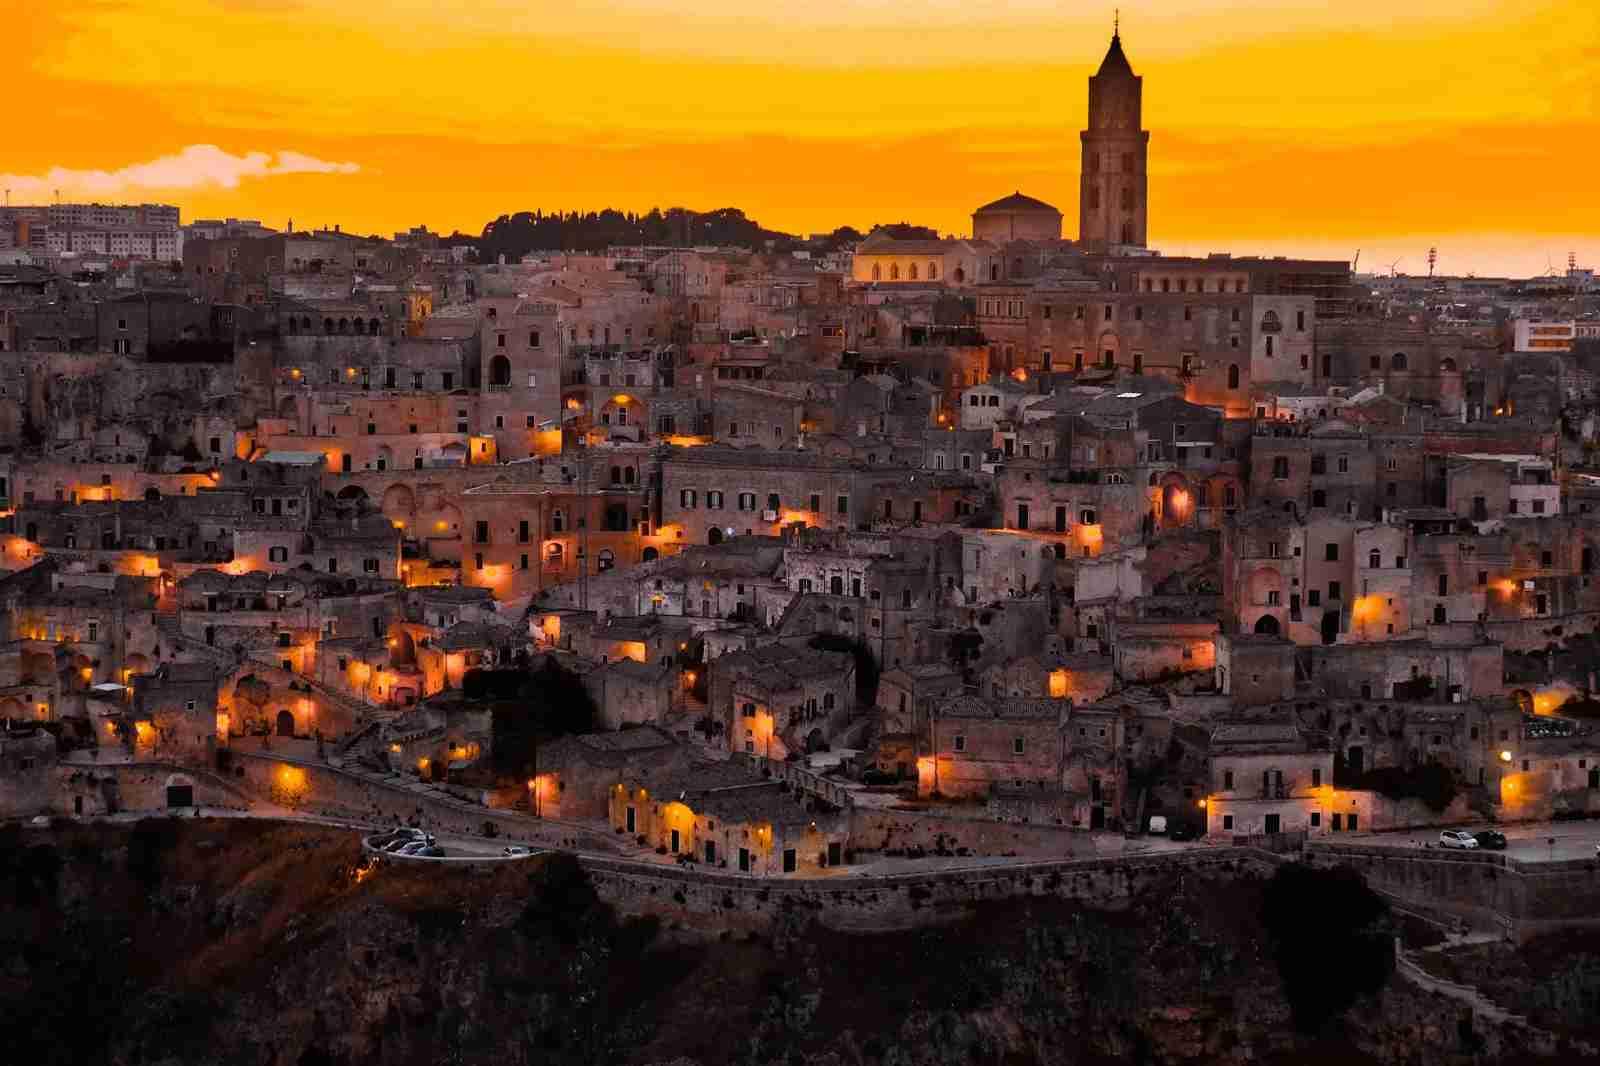 A Matera, Italy nightscape. (Photo by Daniele Levis / Unsplash)